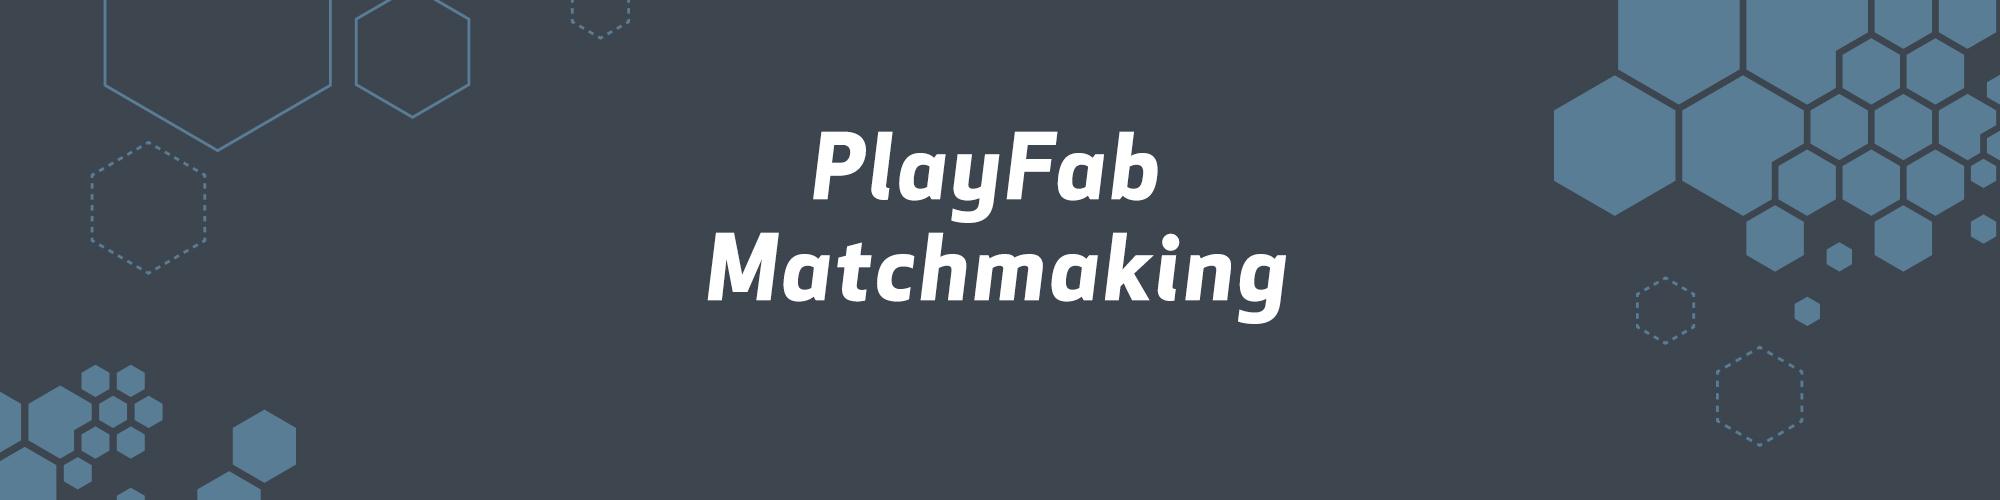 Matchmaking Agence de rencontres Cyrano asiatique wiki